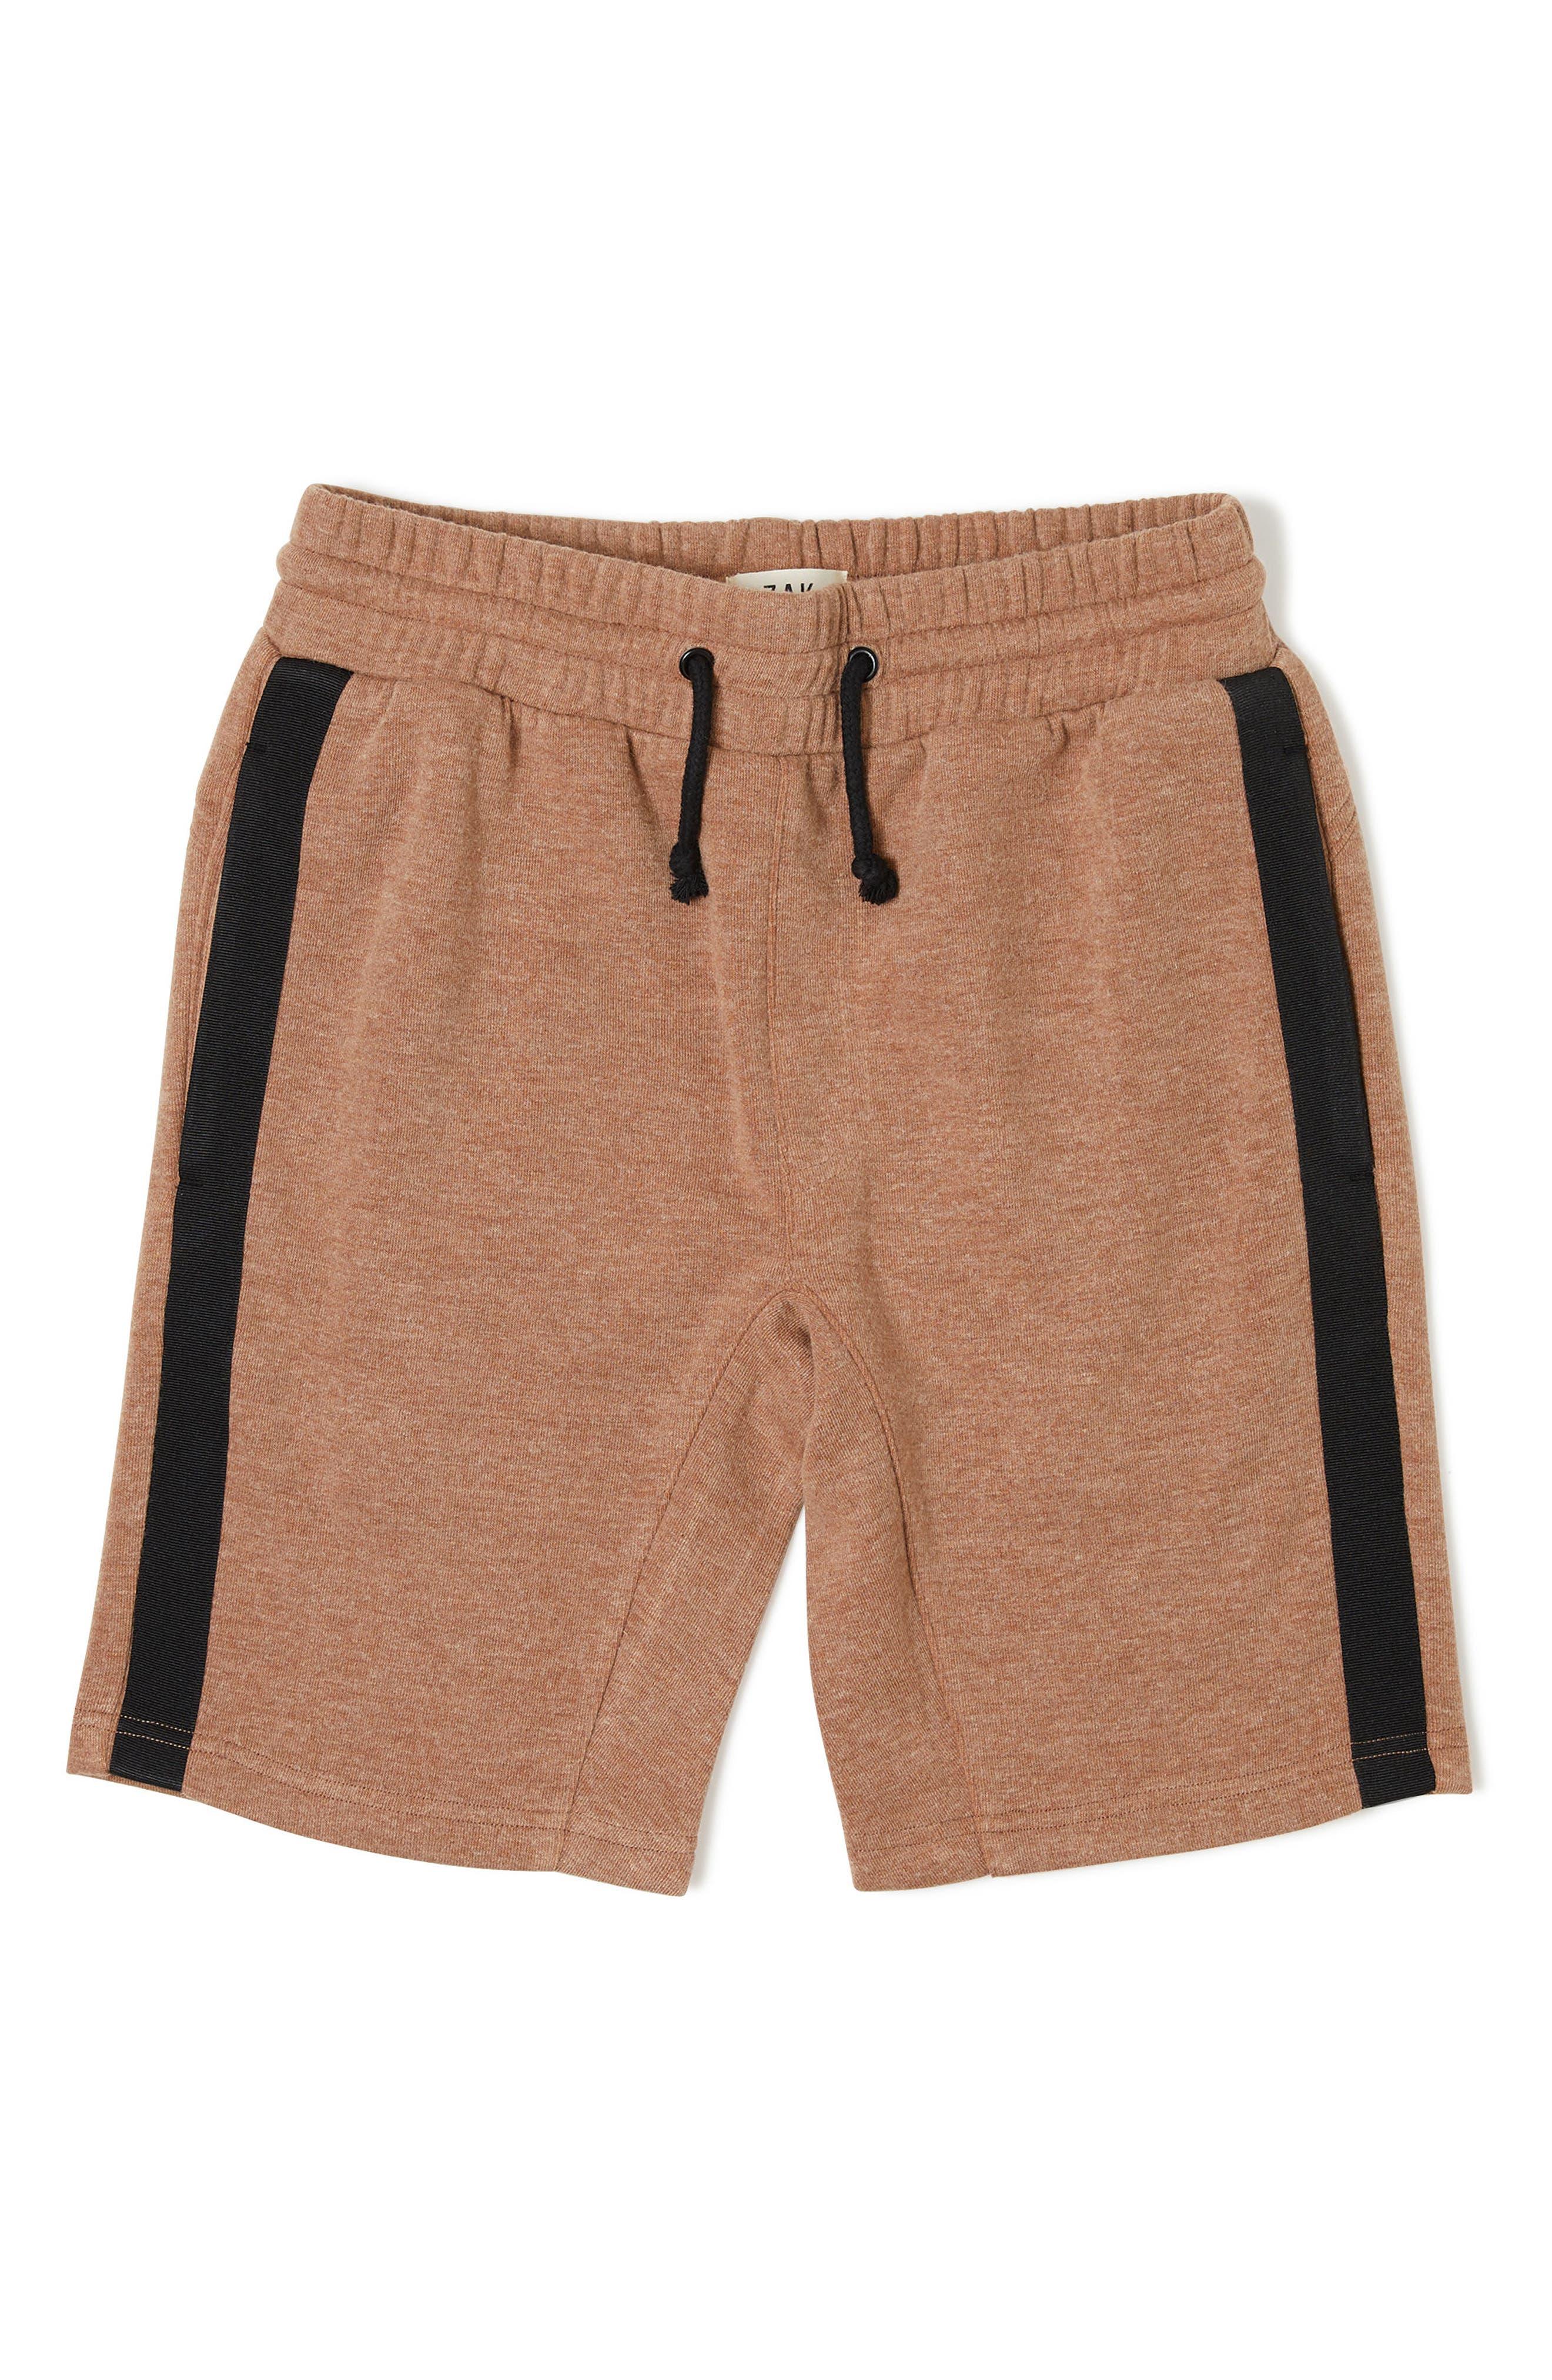 Z.A.K. Brand Rhett Knit Shorts (Little Boys)